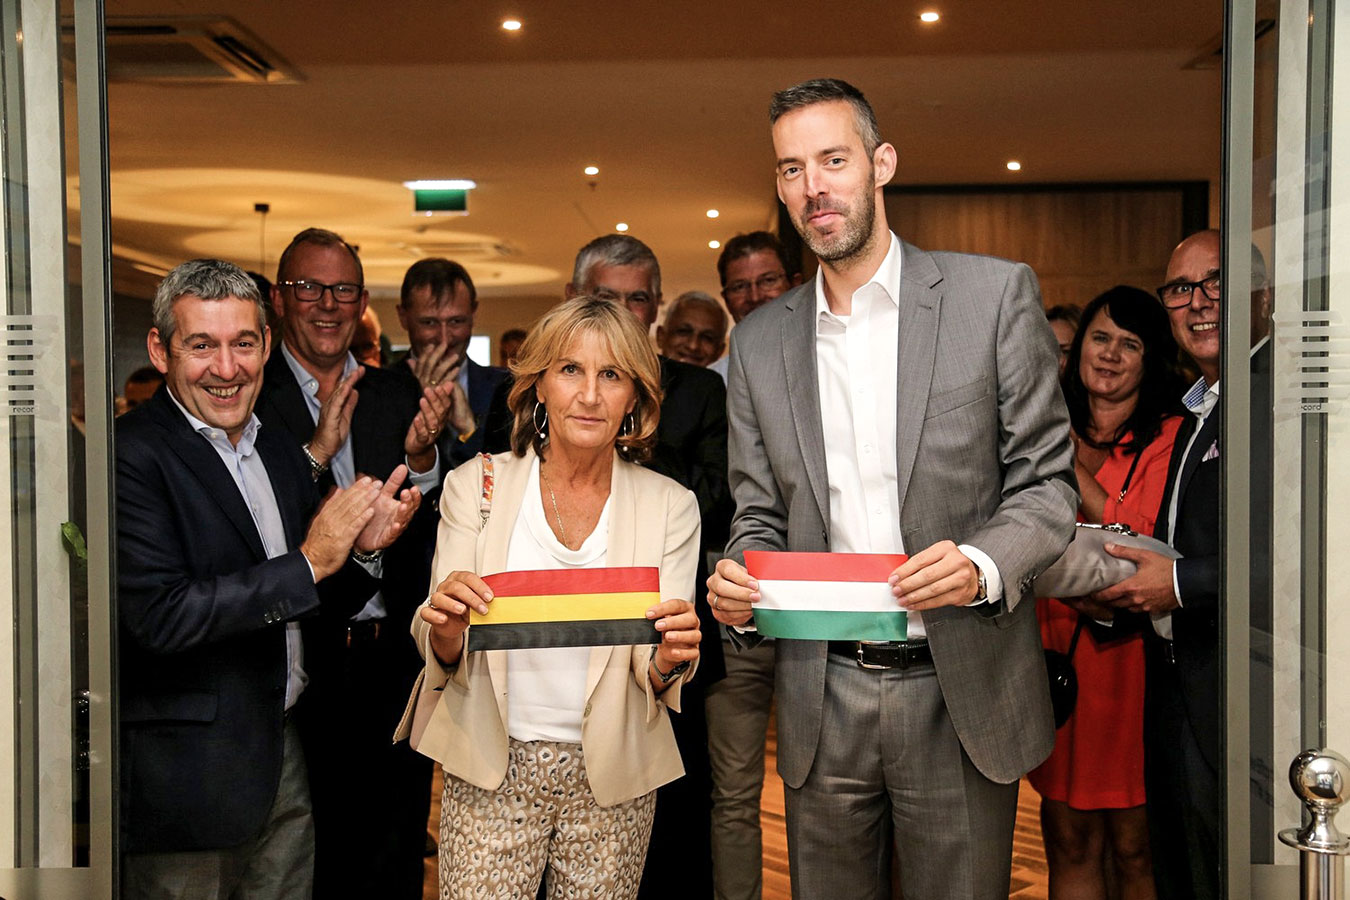 b-marie-france-andre-2018-belgian-hotel-inauguration.jpg